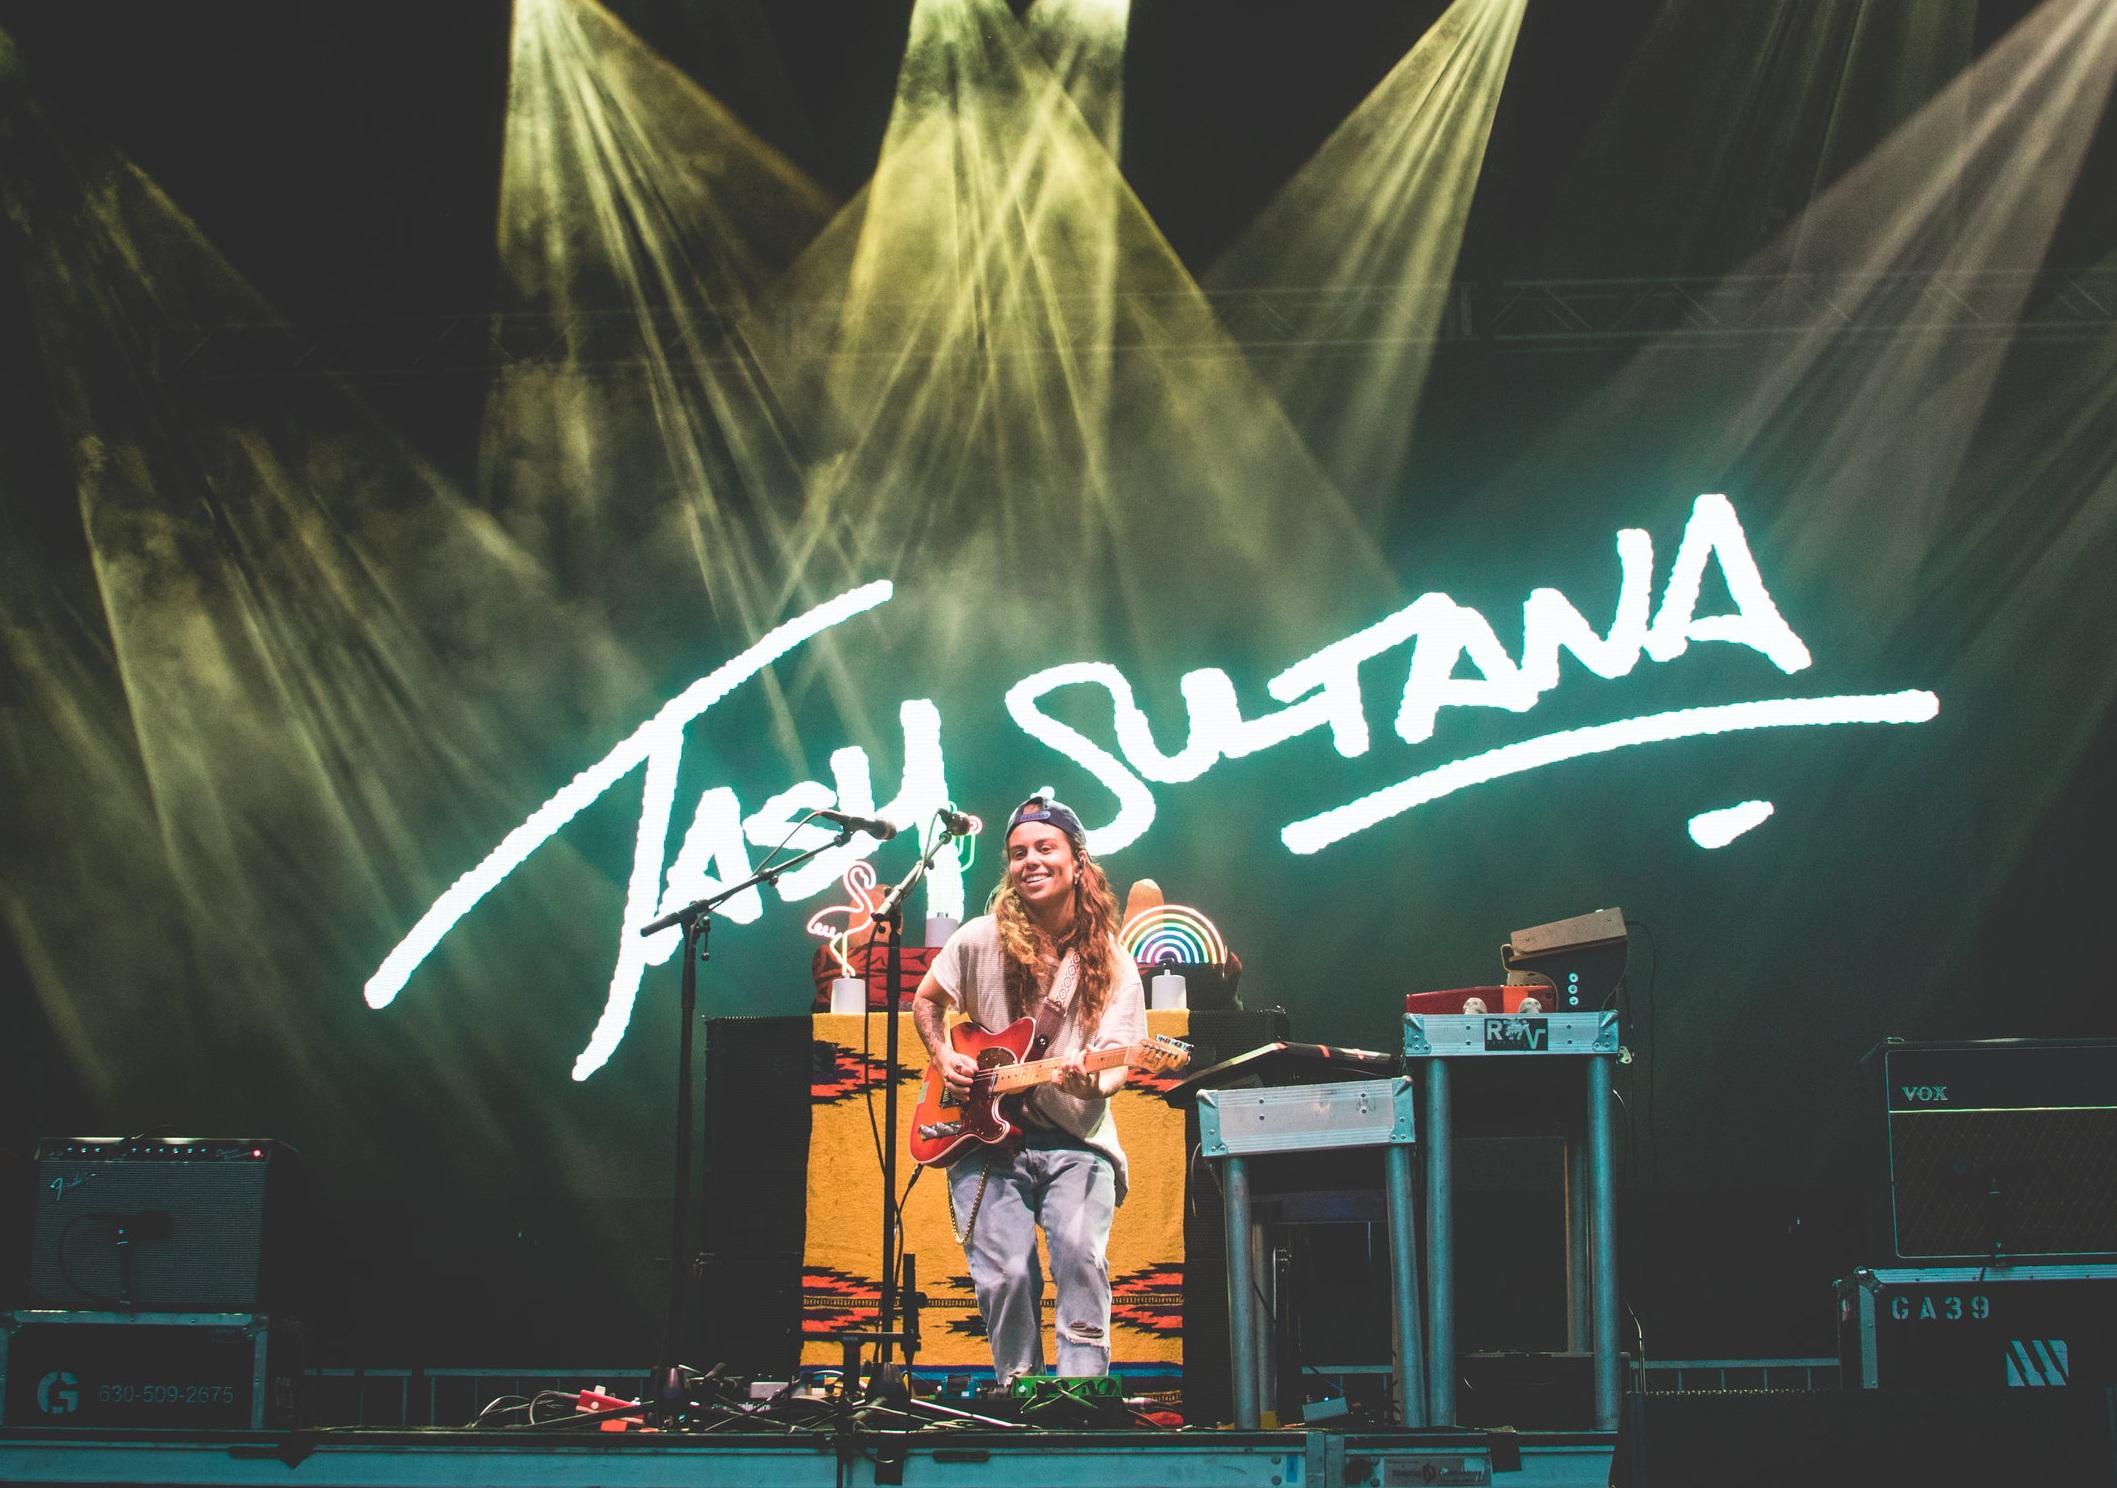 Tash Sultana @ Lollapalooza 2018